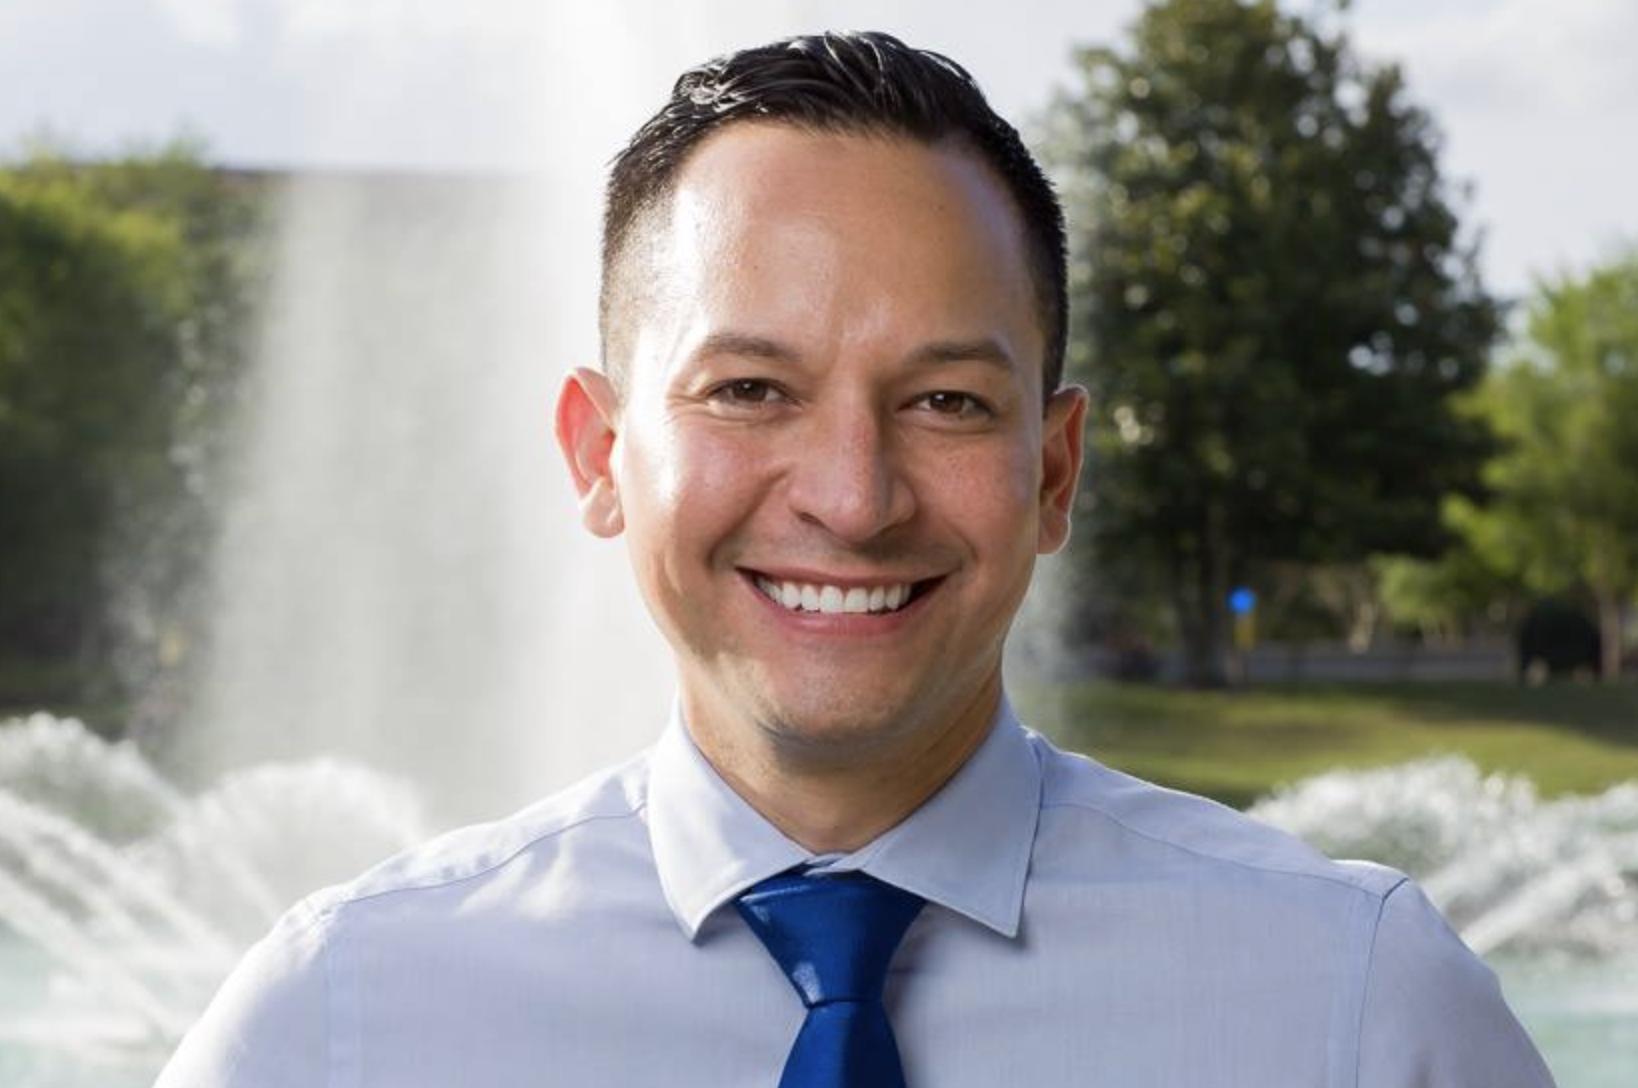 Florida Democrats Ramp Up Anti-Gun Legislation